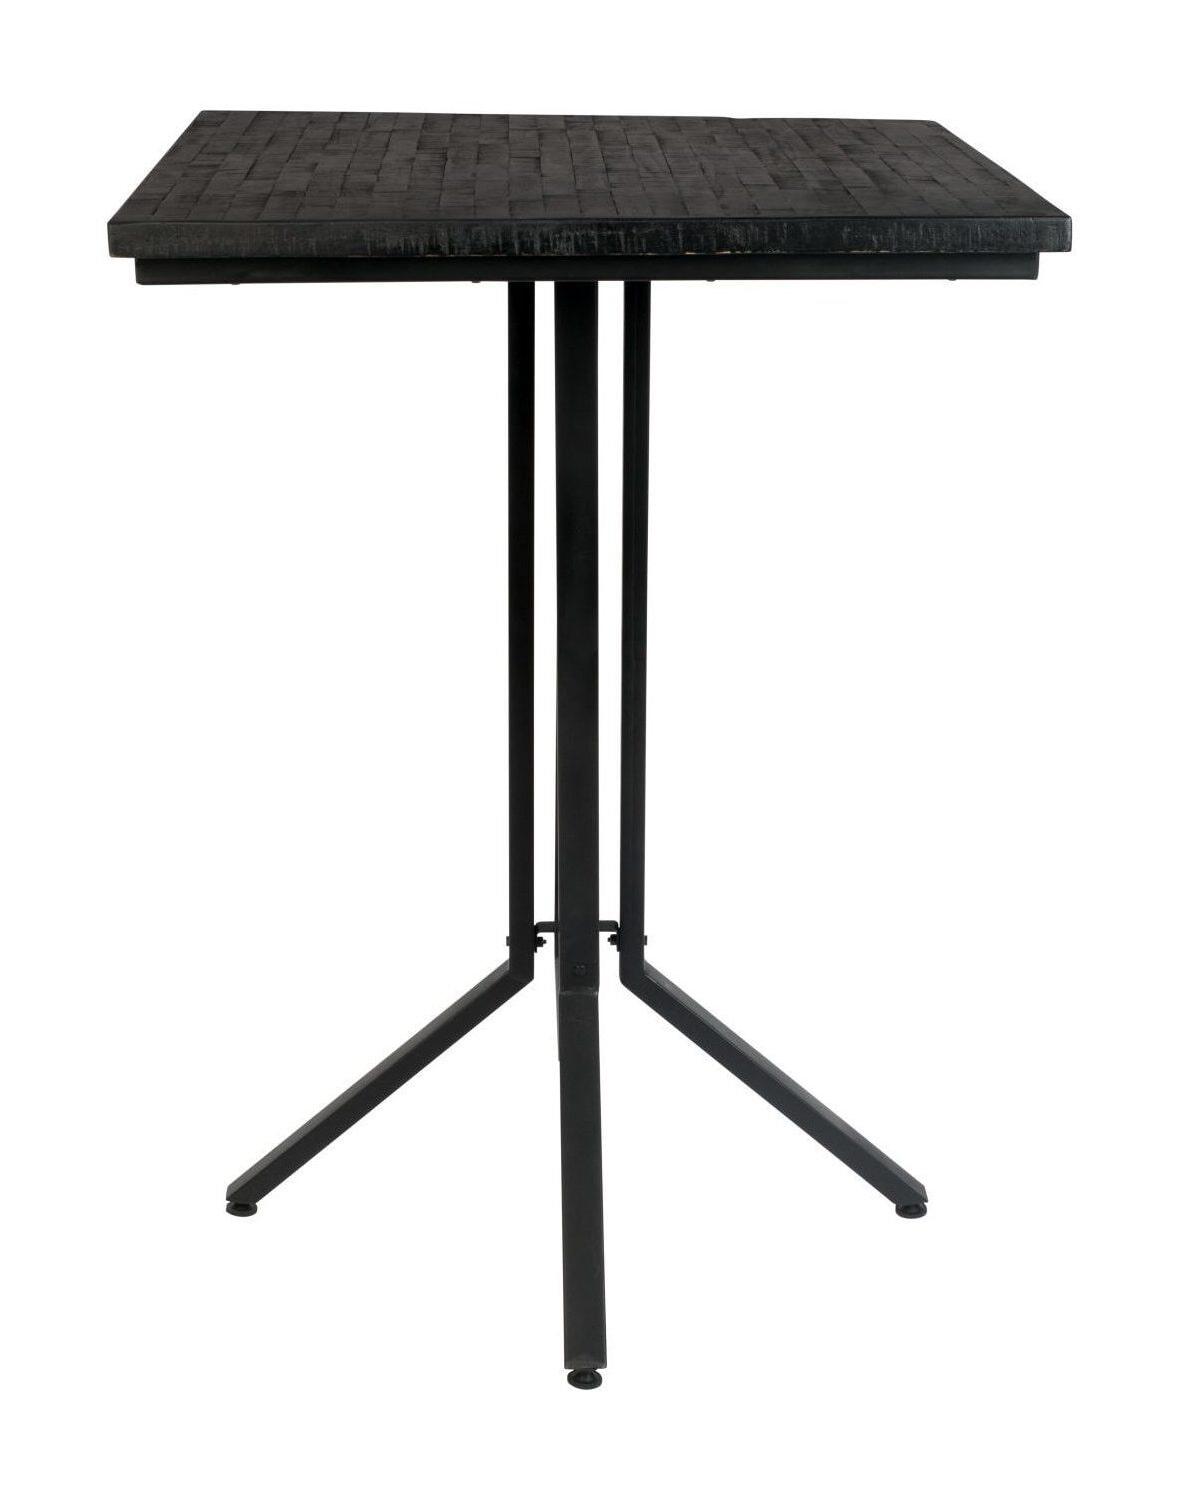 ZILT Bartafel 'Dinelson', Kleur zwart 75 x 75cm hoogte 110cm teak staal aanschaffen? Kijk hier!